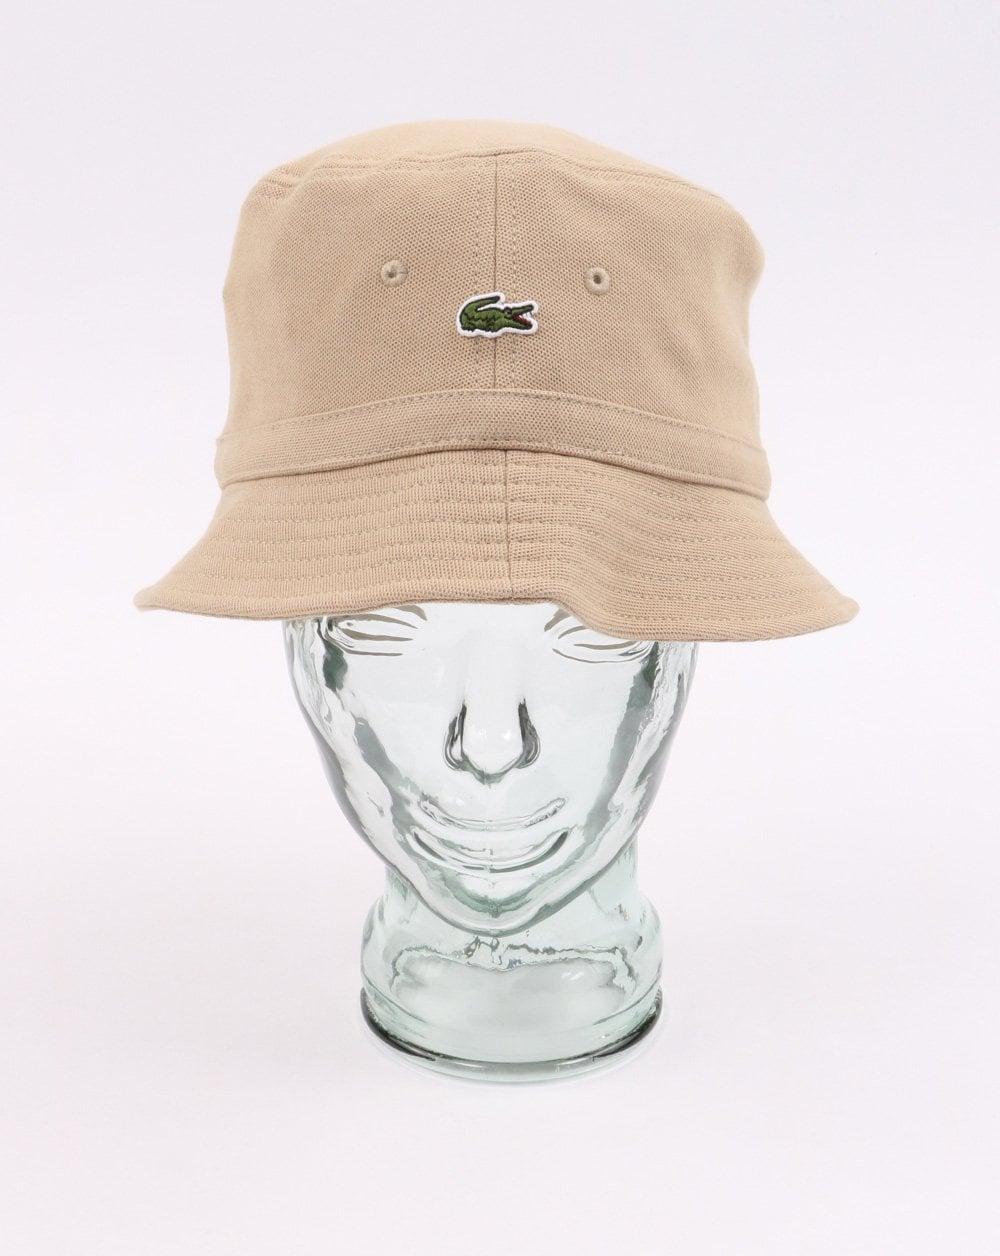 90cc57b0d16cfb Lacoste Bucket Hat in Beige   80s Casual Classics